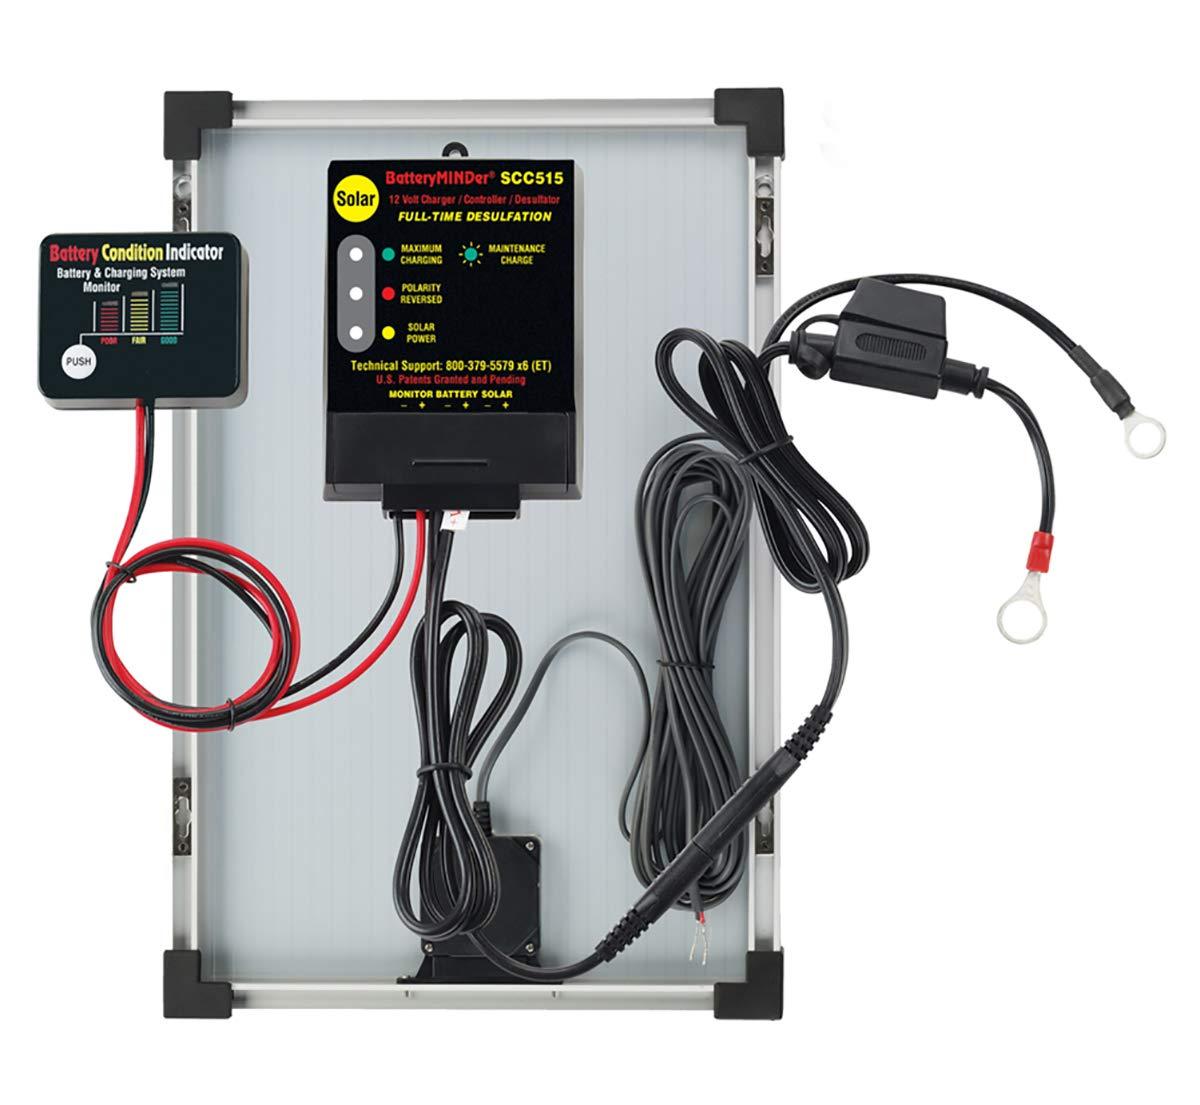 BatteryMINDer SCC-515-15 12 Volt 15-Watt Panel Solar Battery Charger/Controller/Desulfator - Designed for Cars, Trucks, Motorcycles, ATV, Boat, RV, etc.